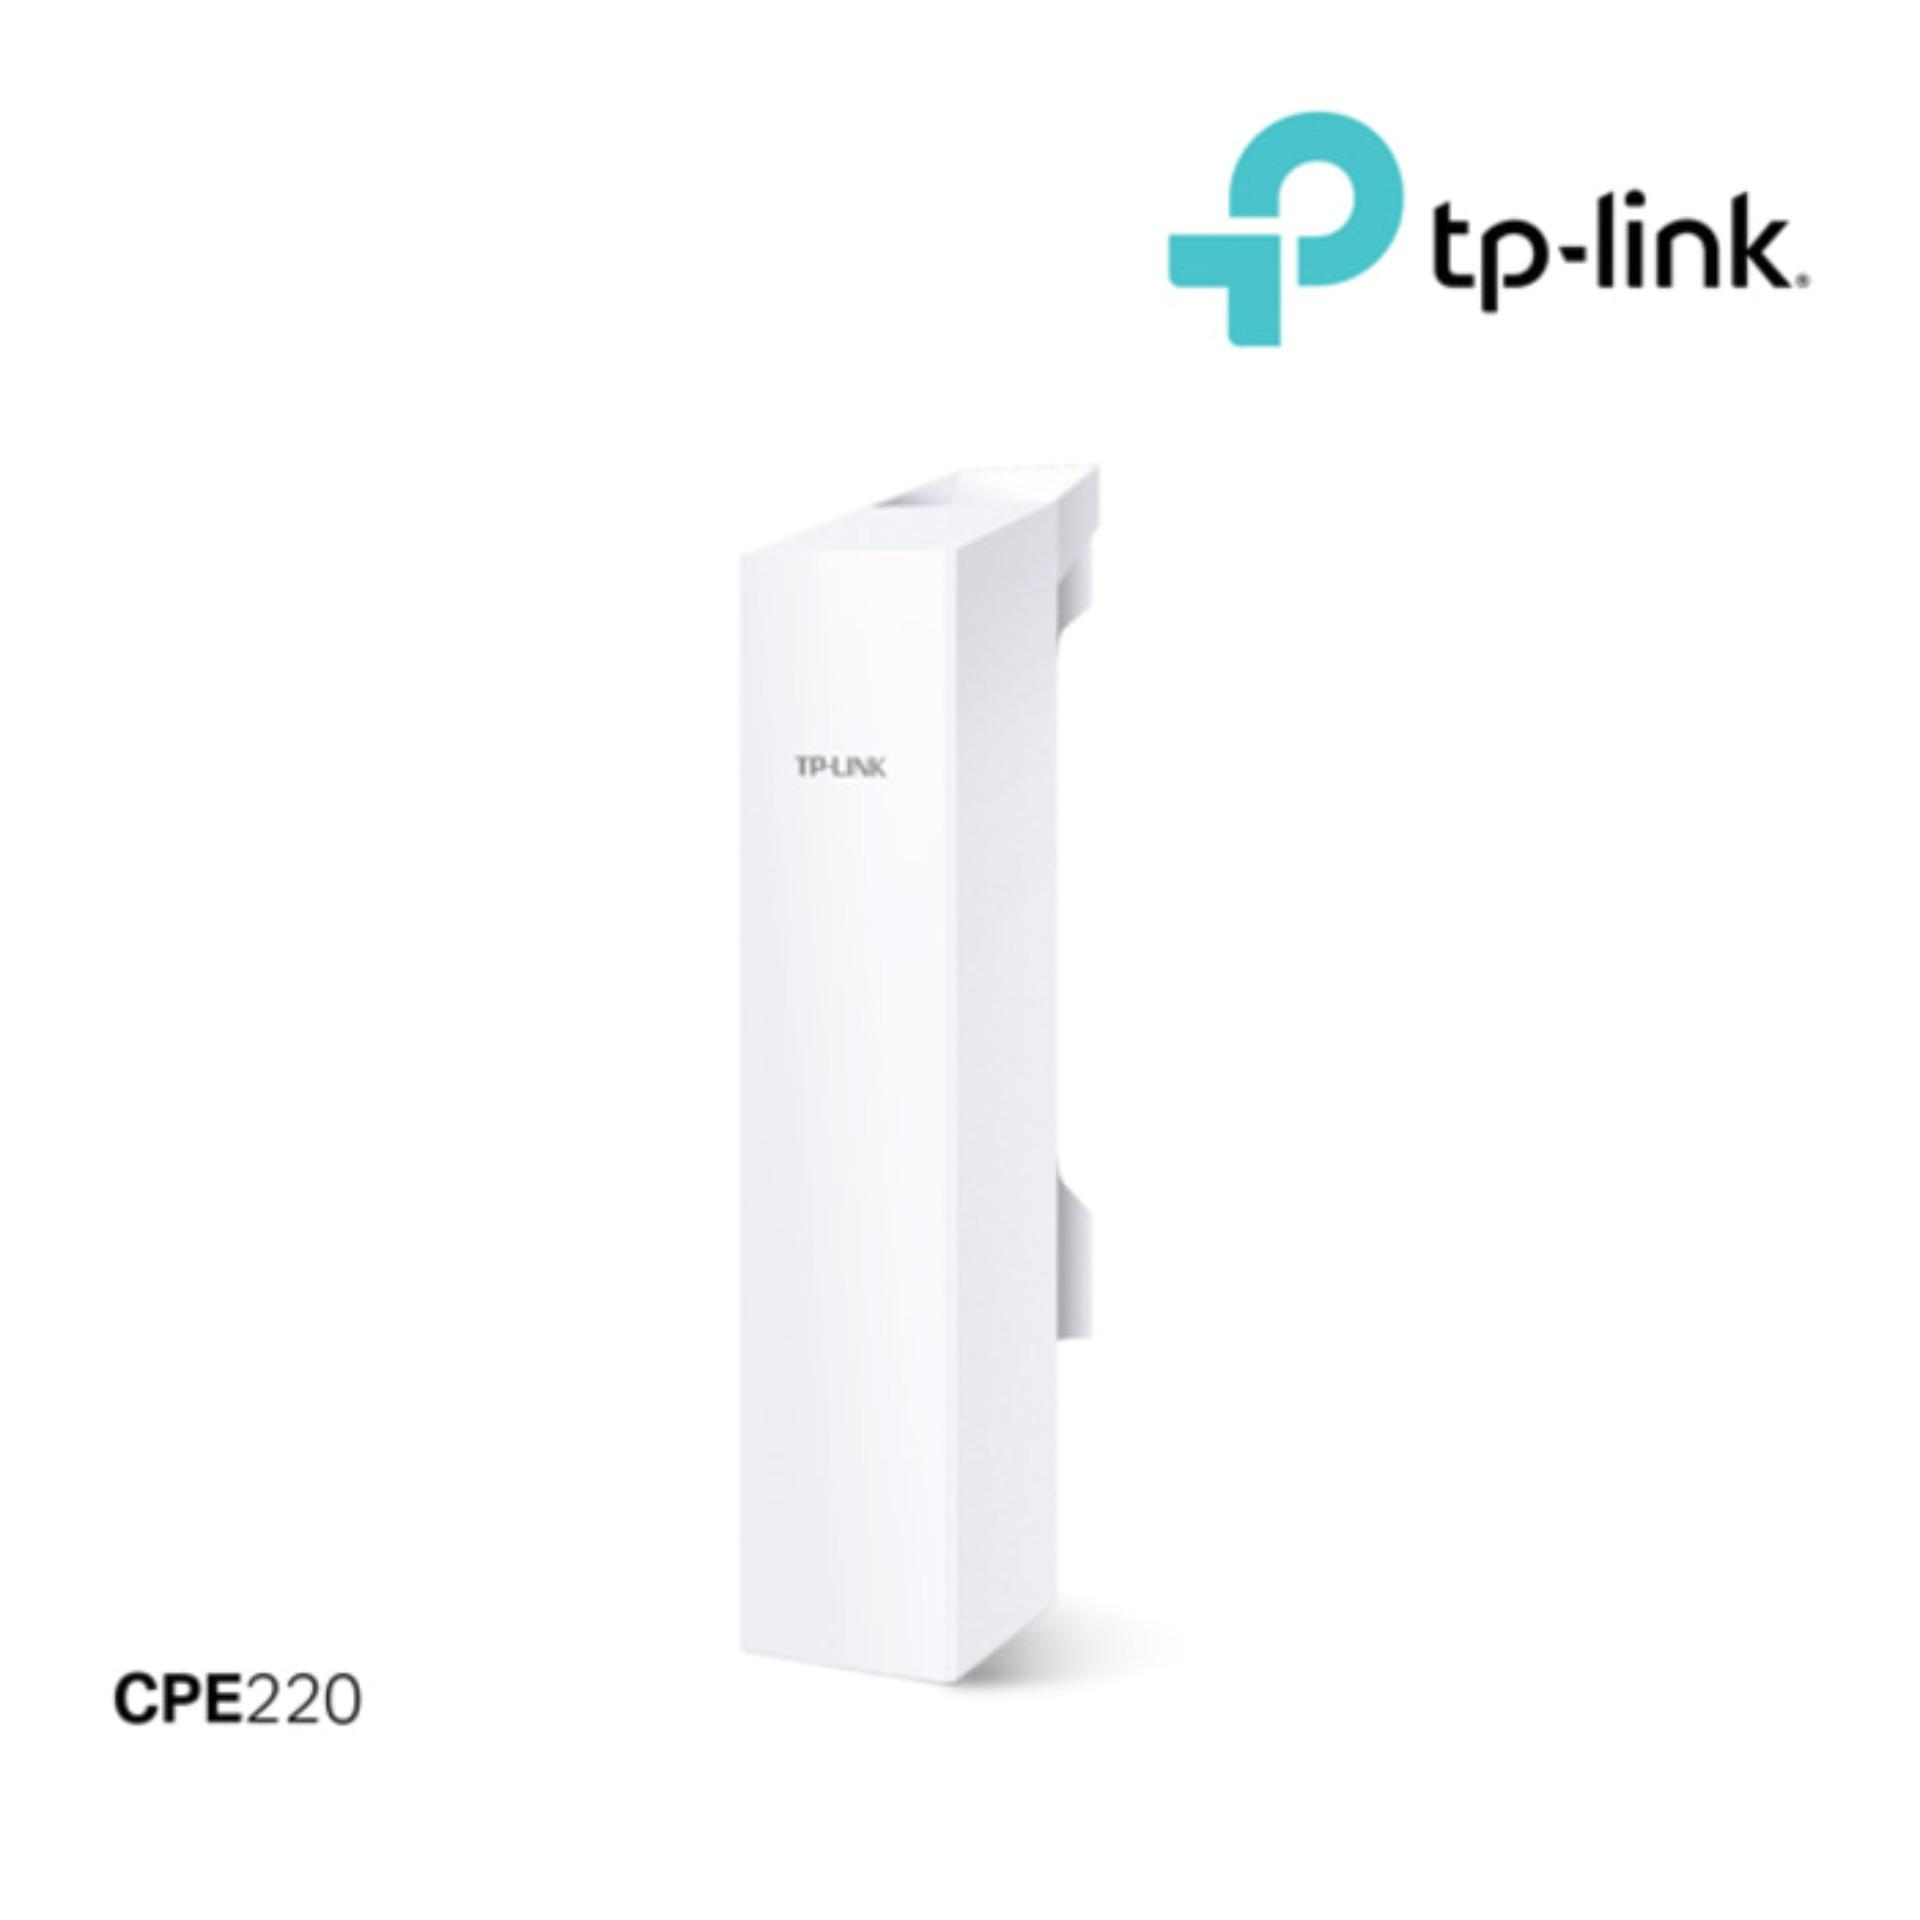 TP-LINK CPE220 2.4GHz 300Mbps 12dBi